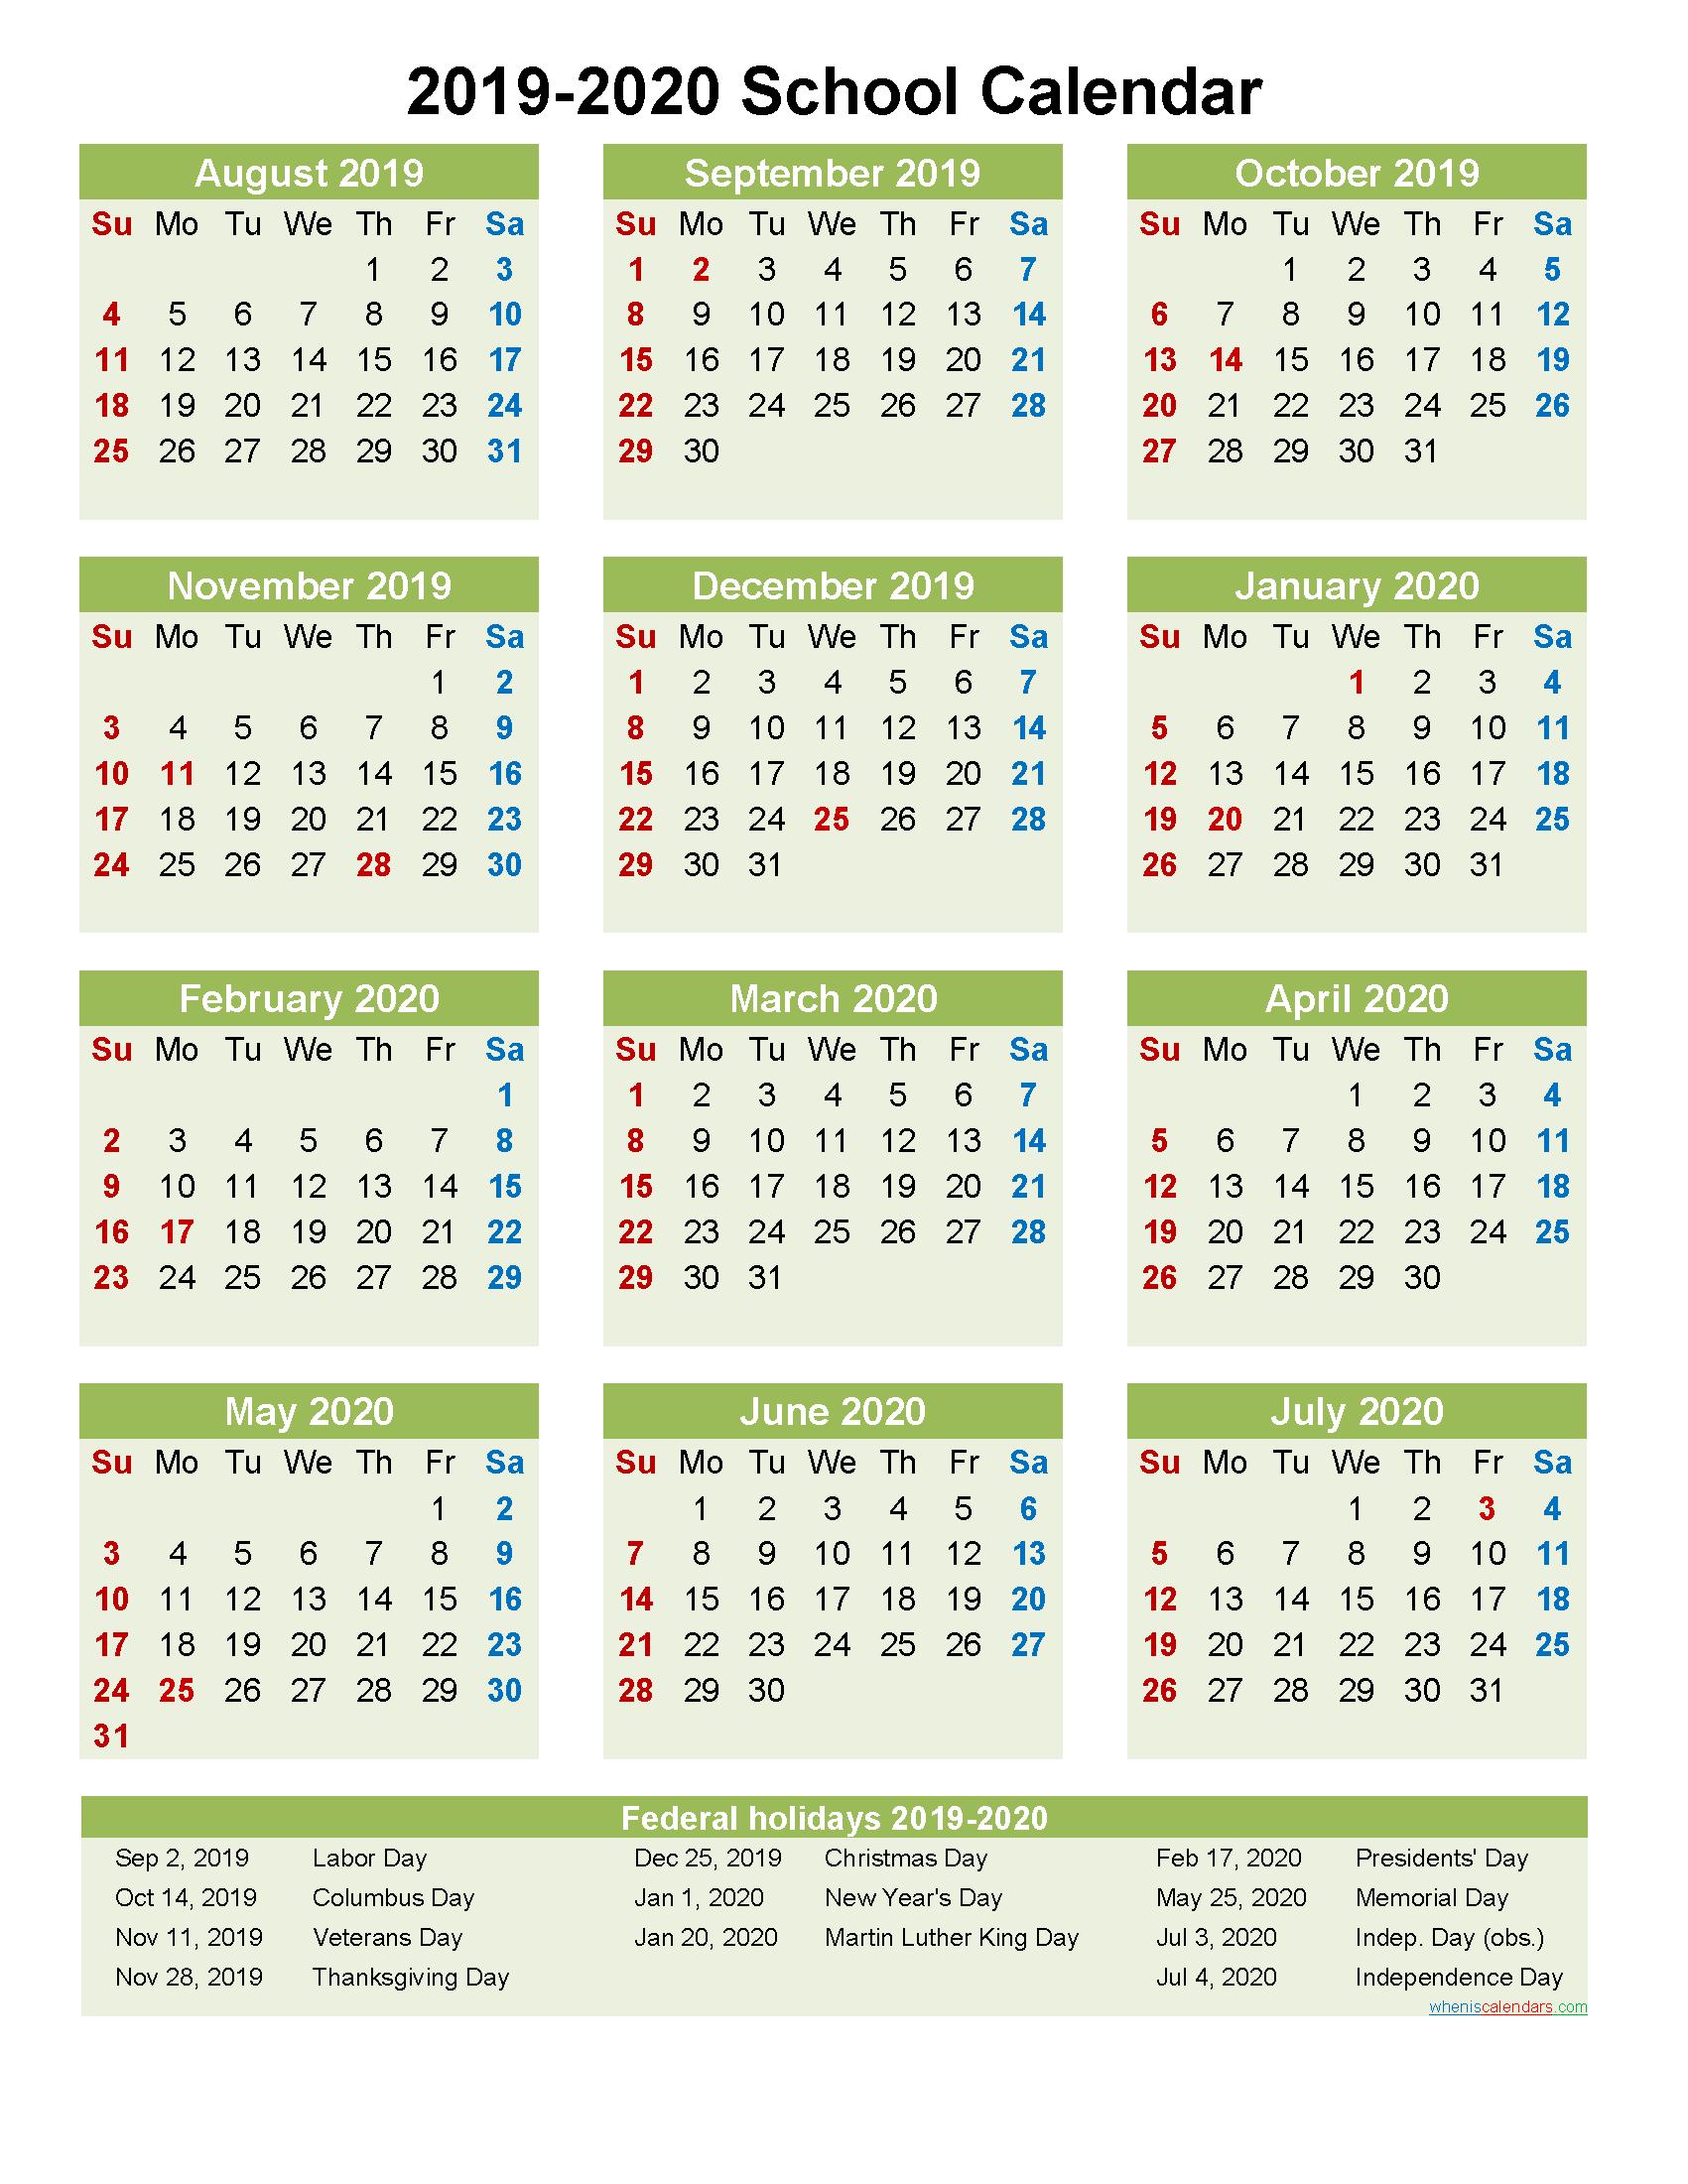 2019 and 2020 School Calendar Printable